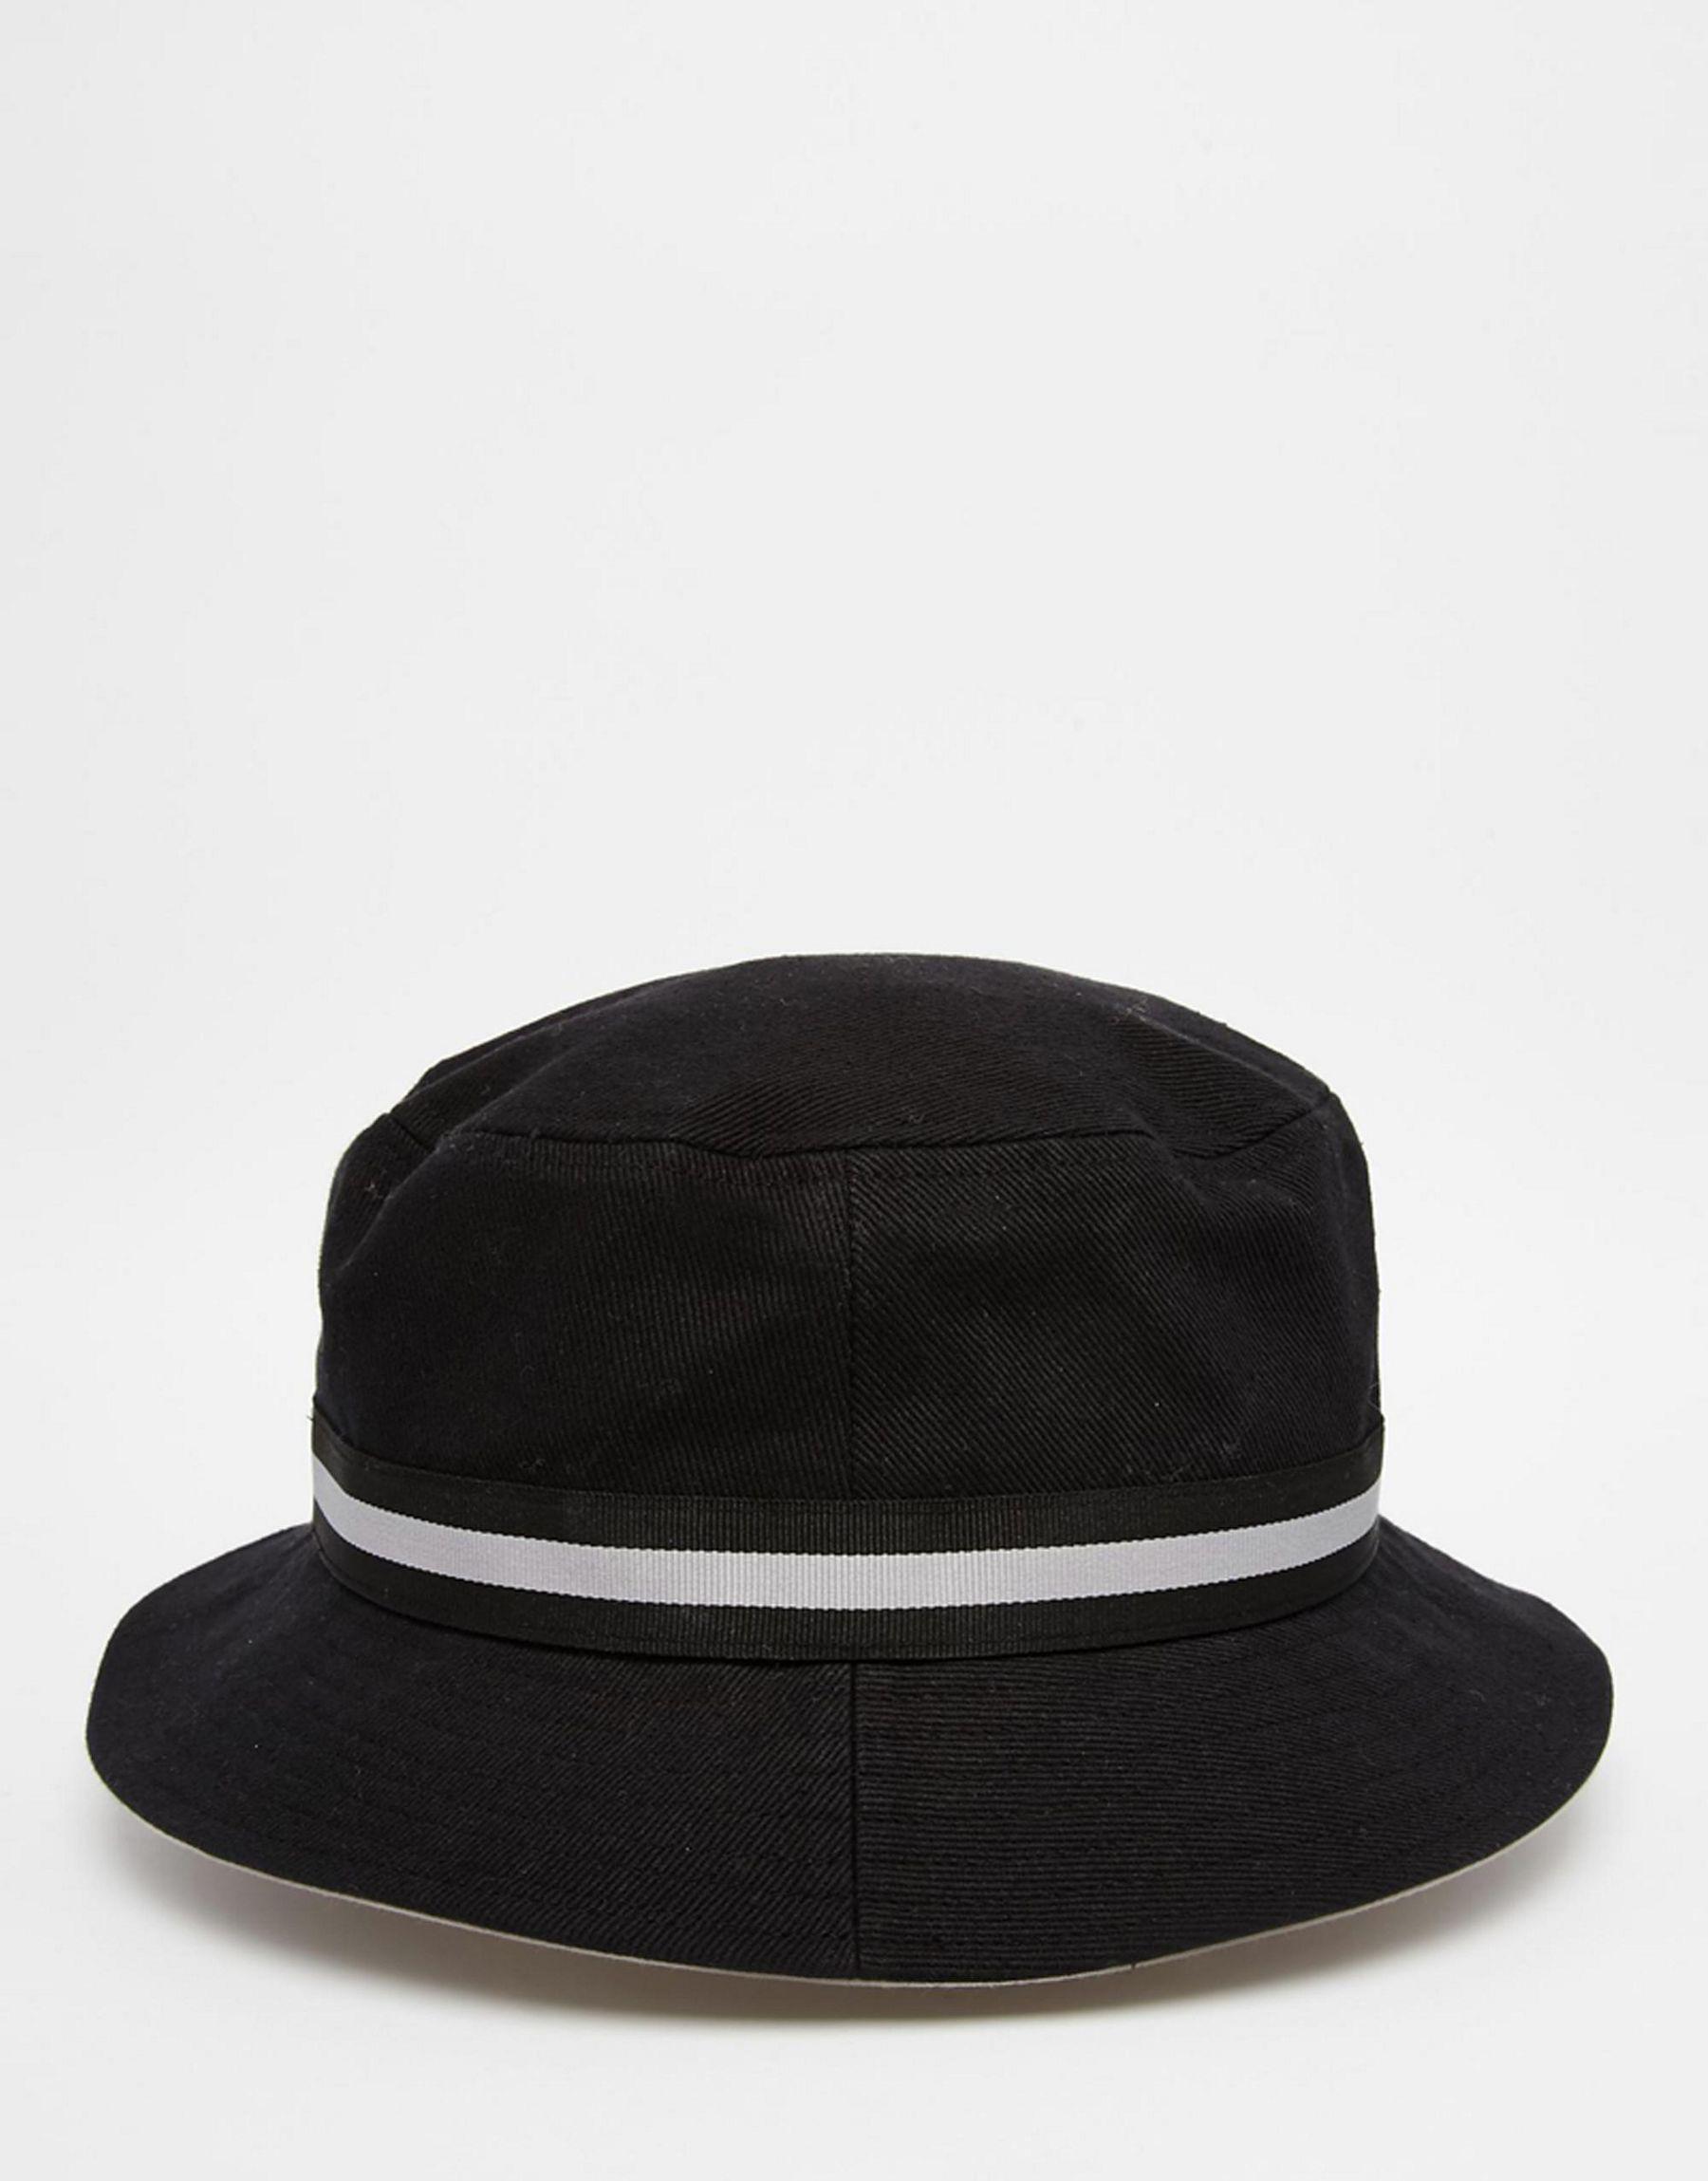 ee64c7d39ef ... get lyst kangol lahinch bucket hat in black for men ca3bf 975ab  shopping nike jordan ...